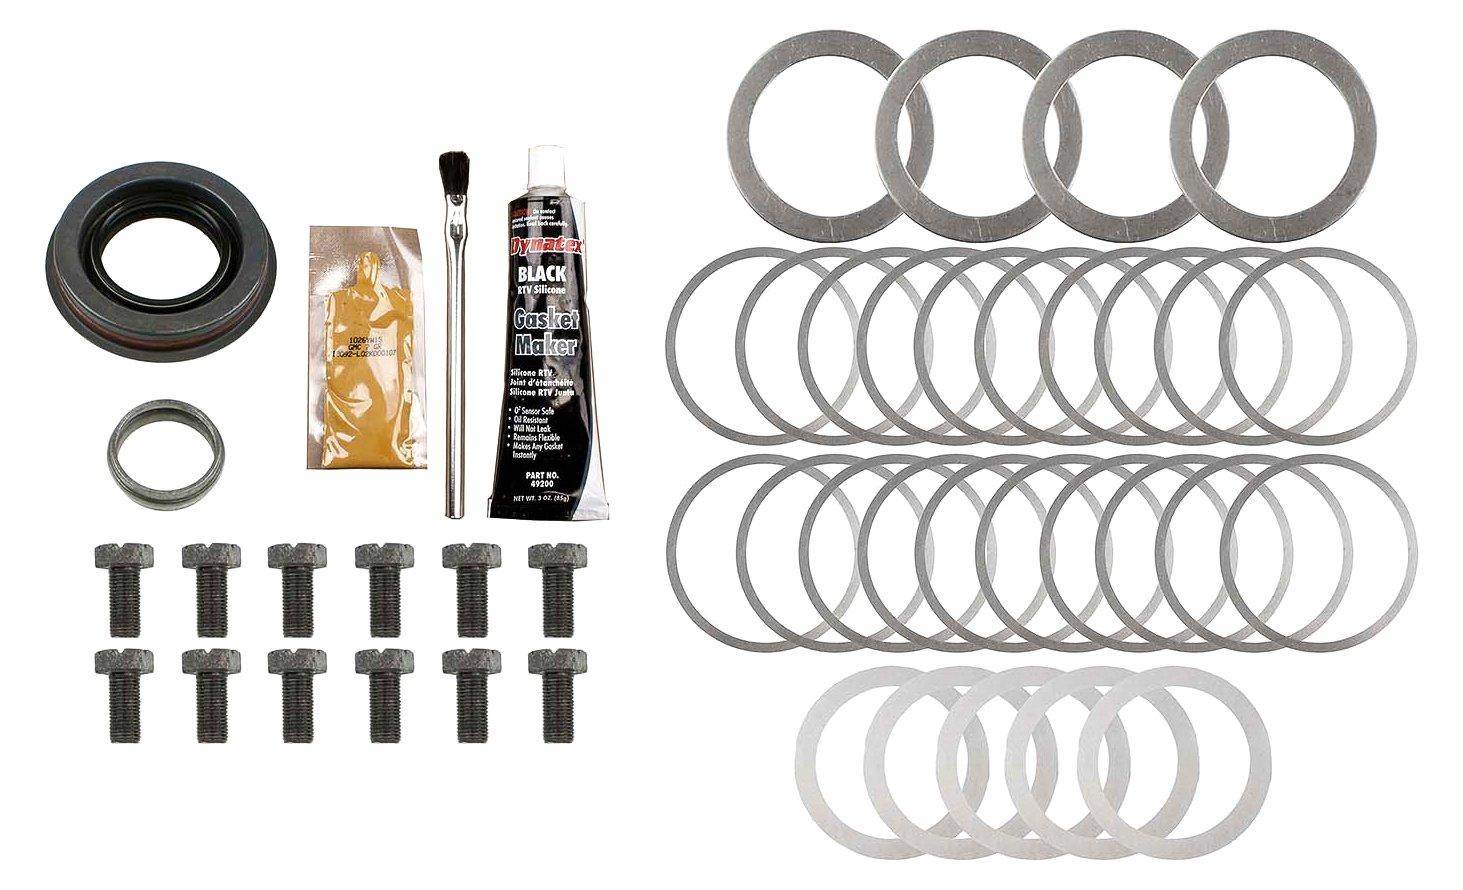 Motive Gear F10.5IK Ring and Pinion Installation Kit by Motive Gear